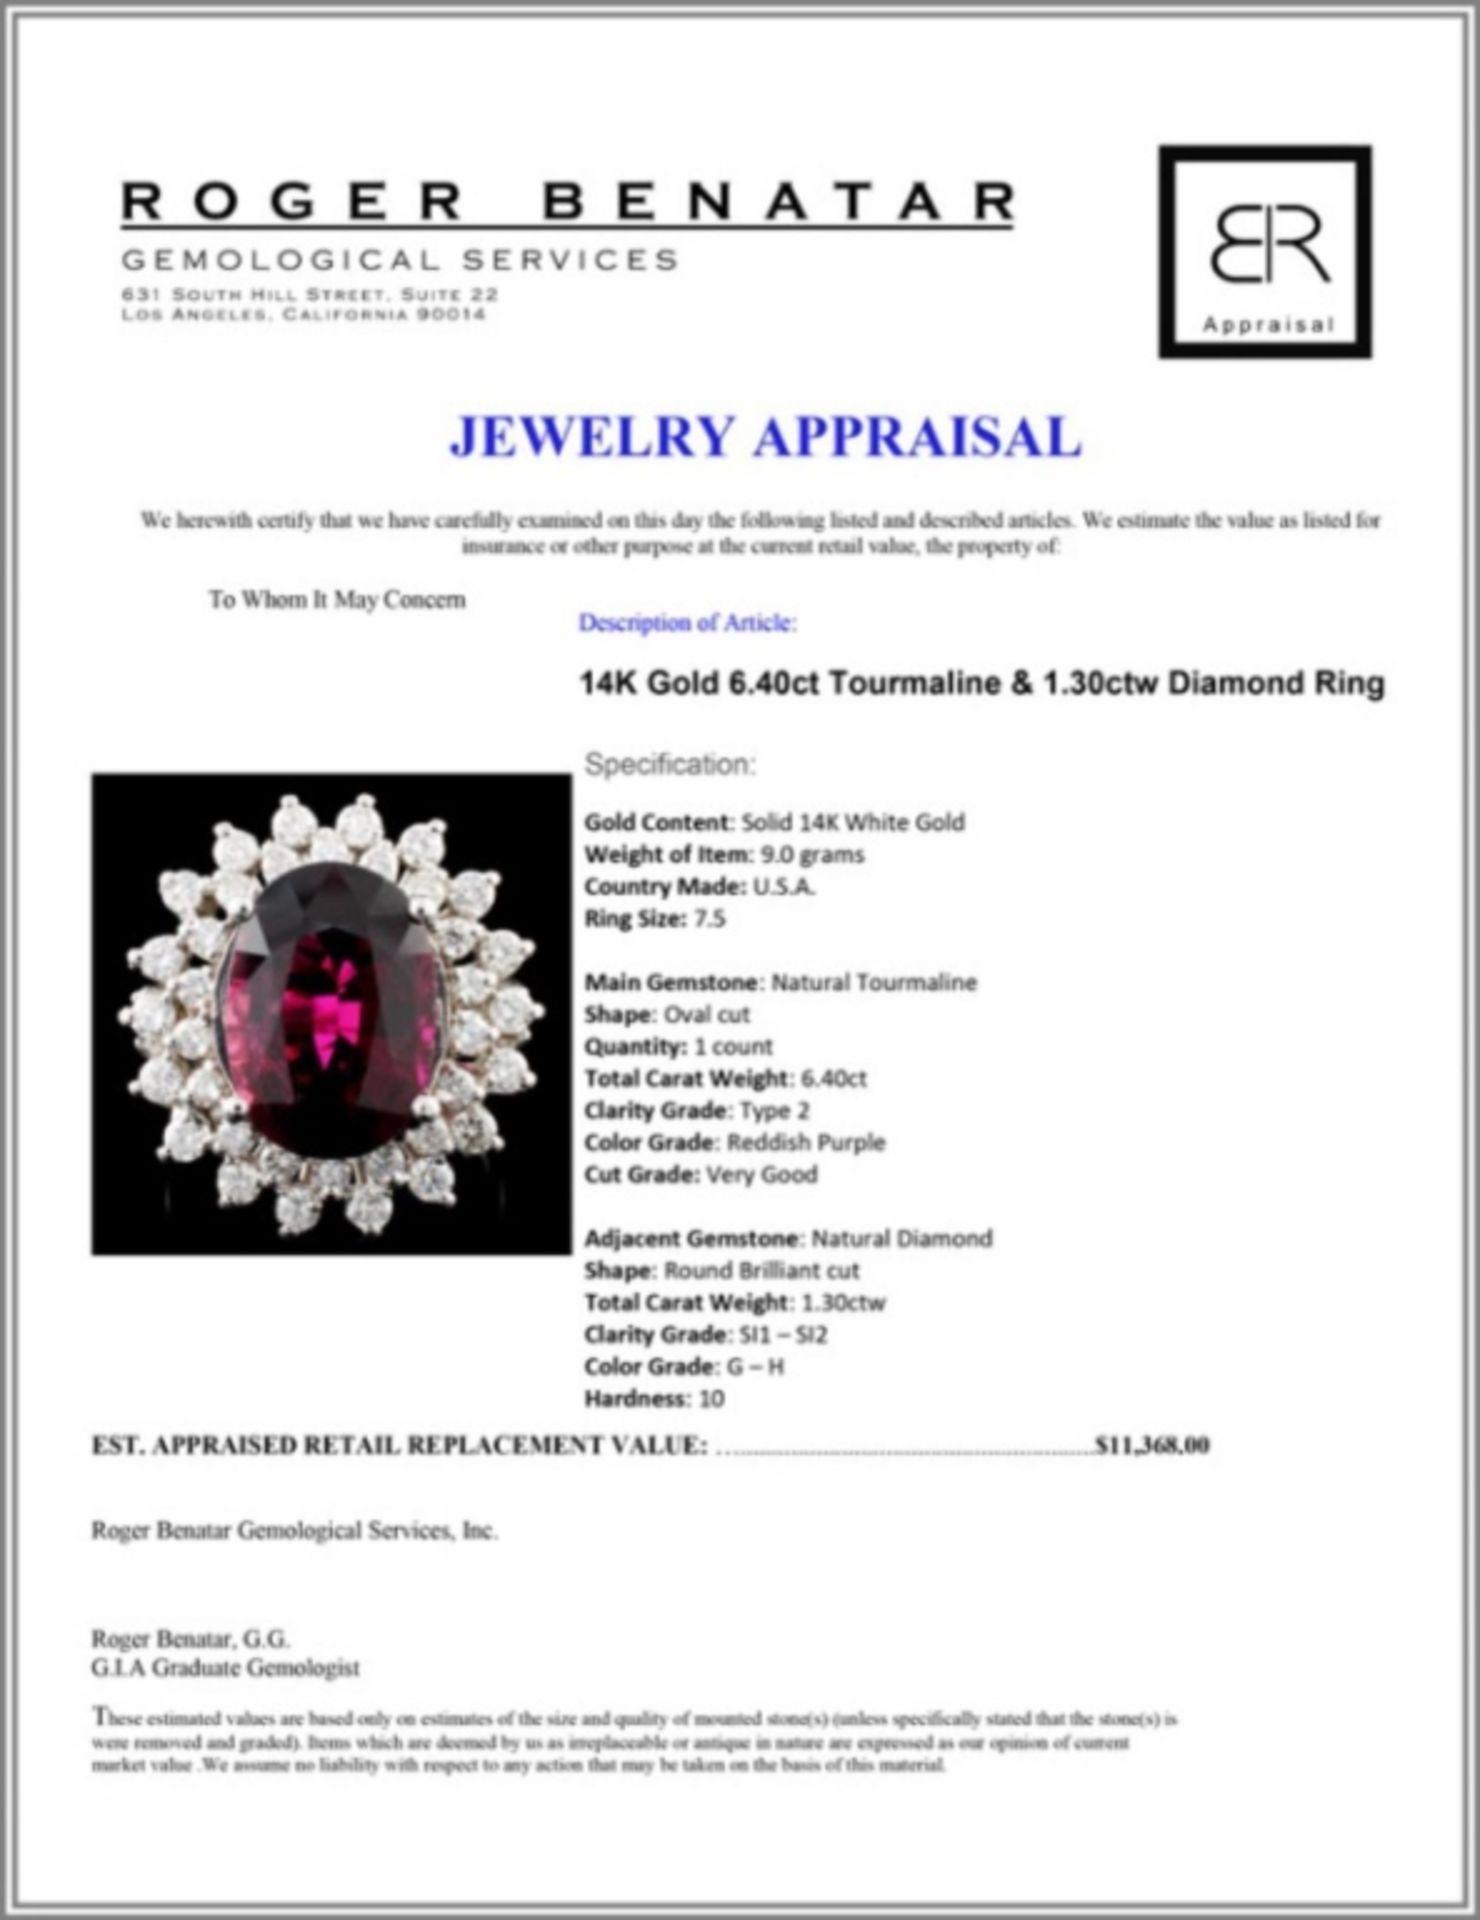 14K Gold 6.40ct Tourmaline & 1.30ctw Diamond Ring - Image 4 of 4